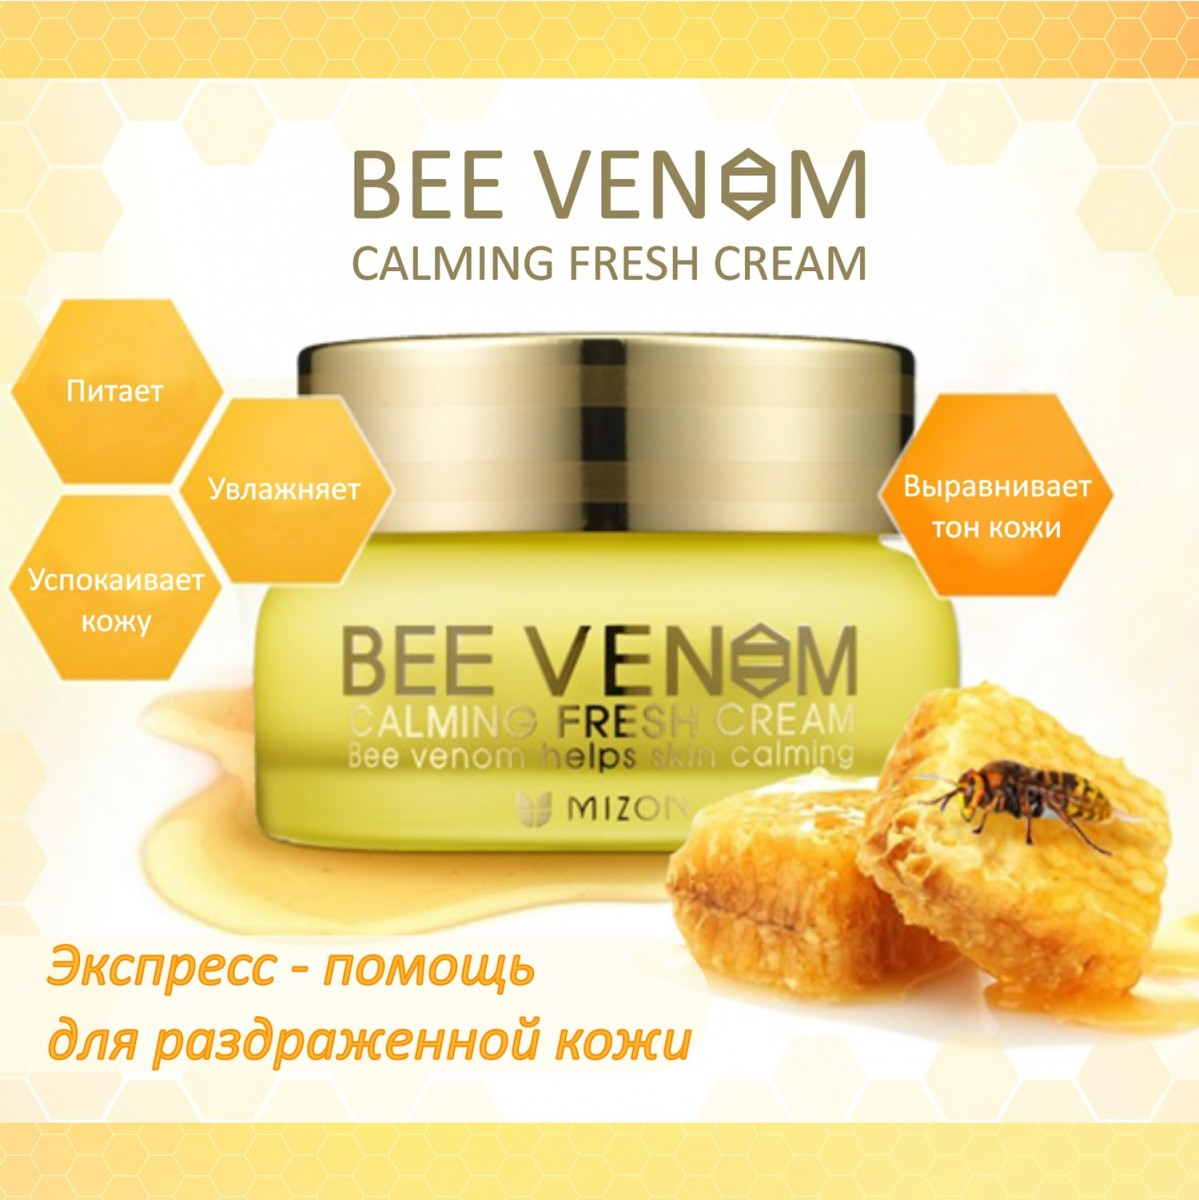 Bee Venom Calming Fresh Cream [Mizon]